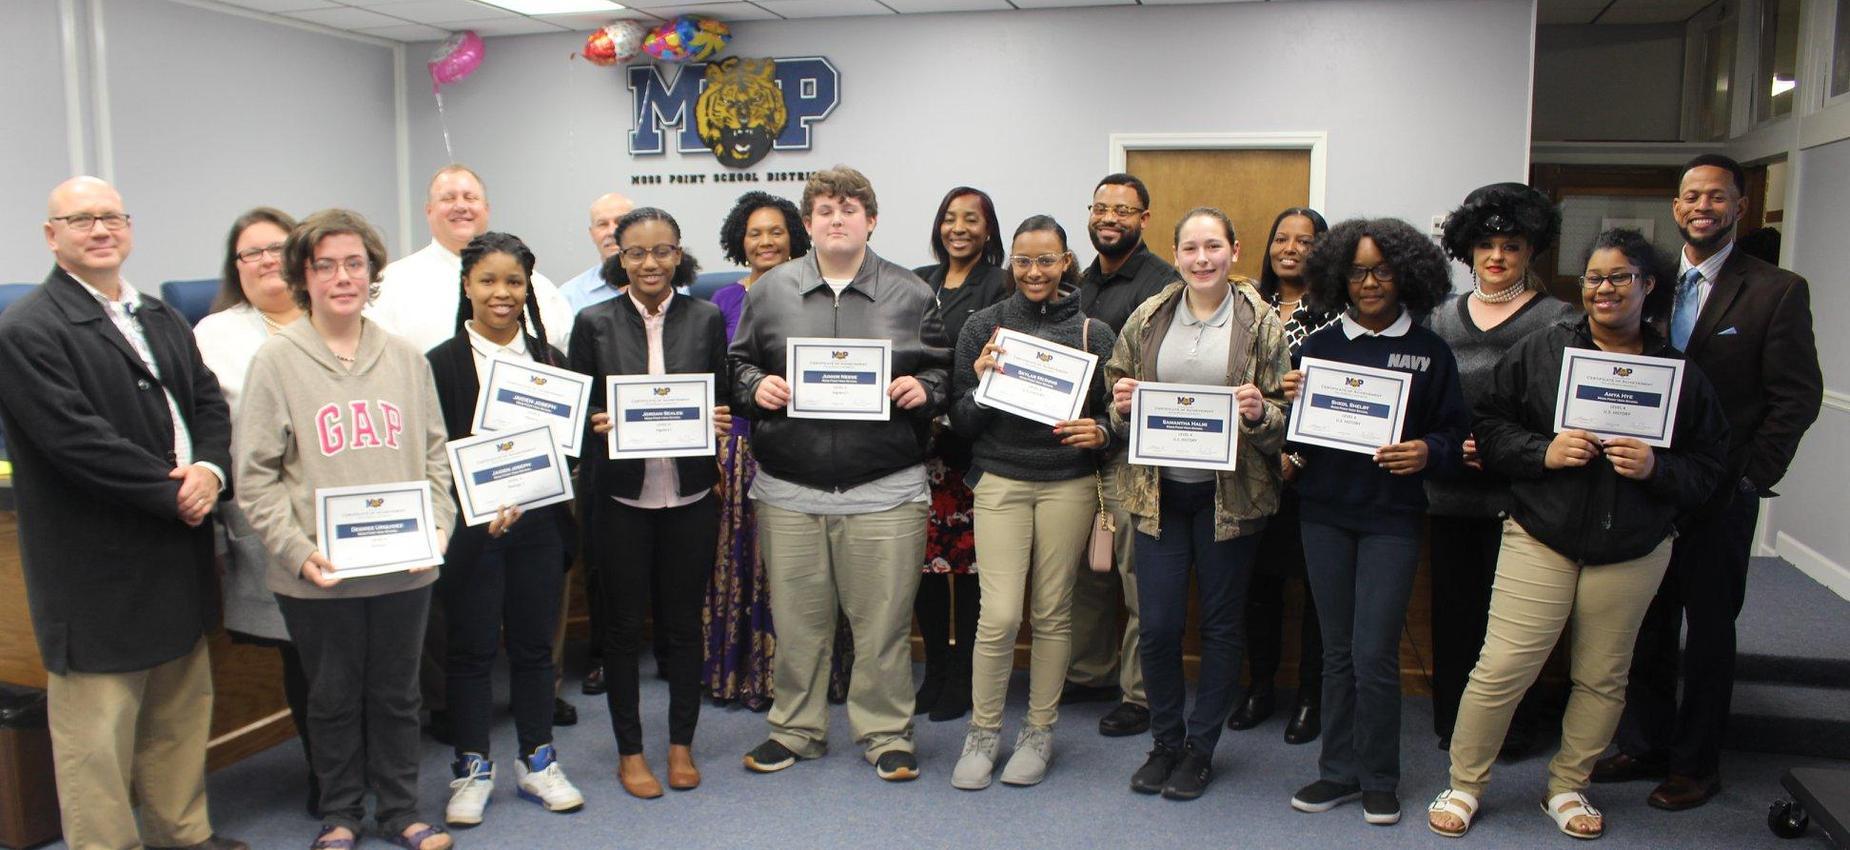 school board awards students